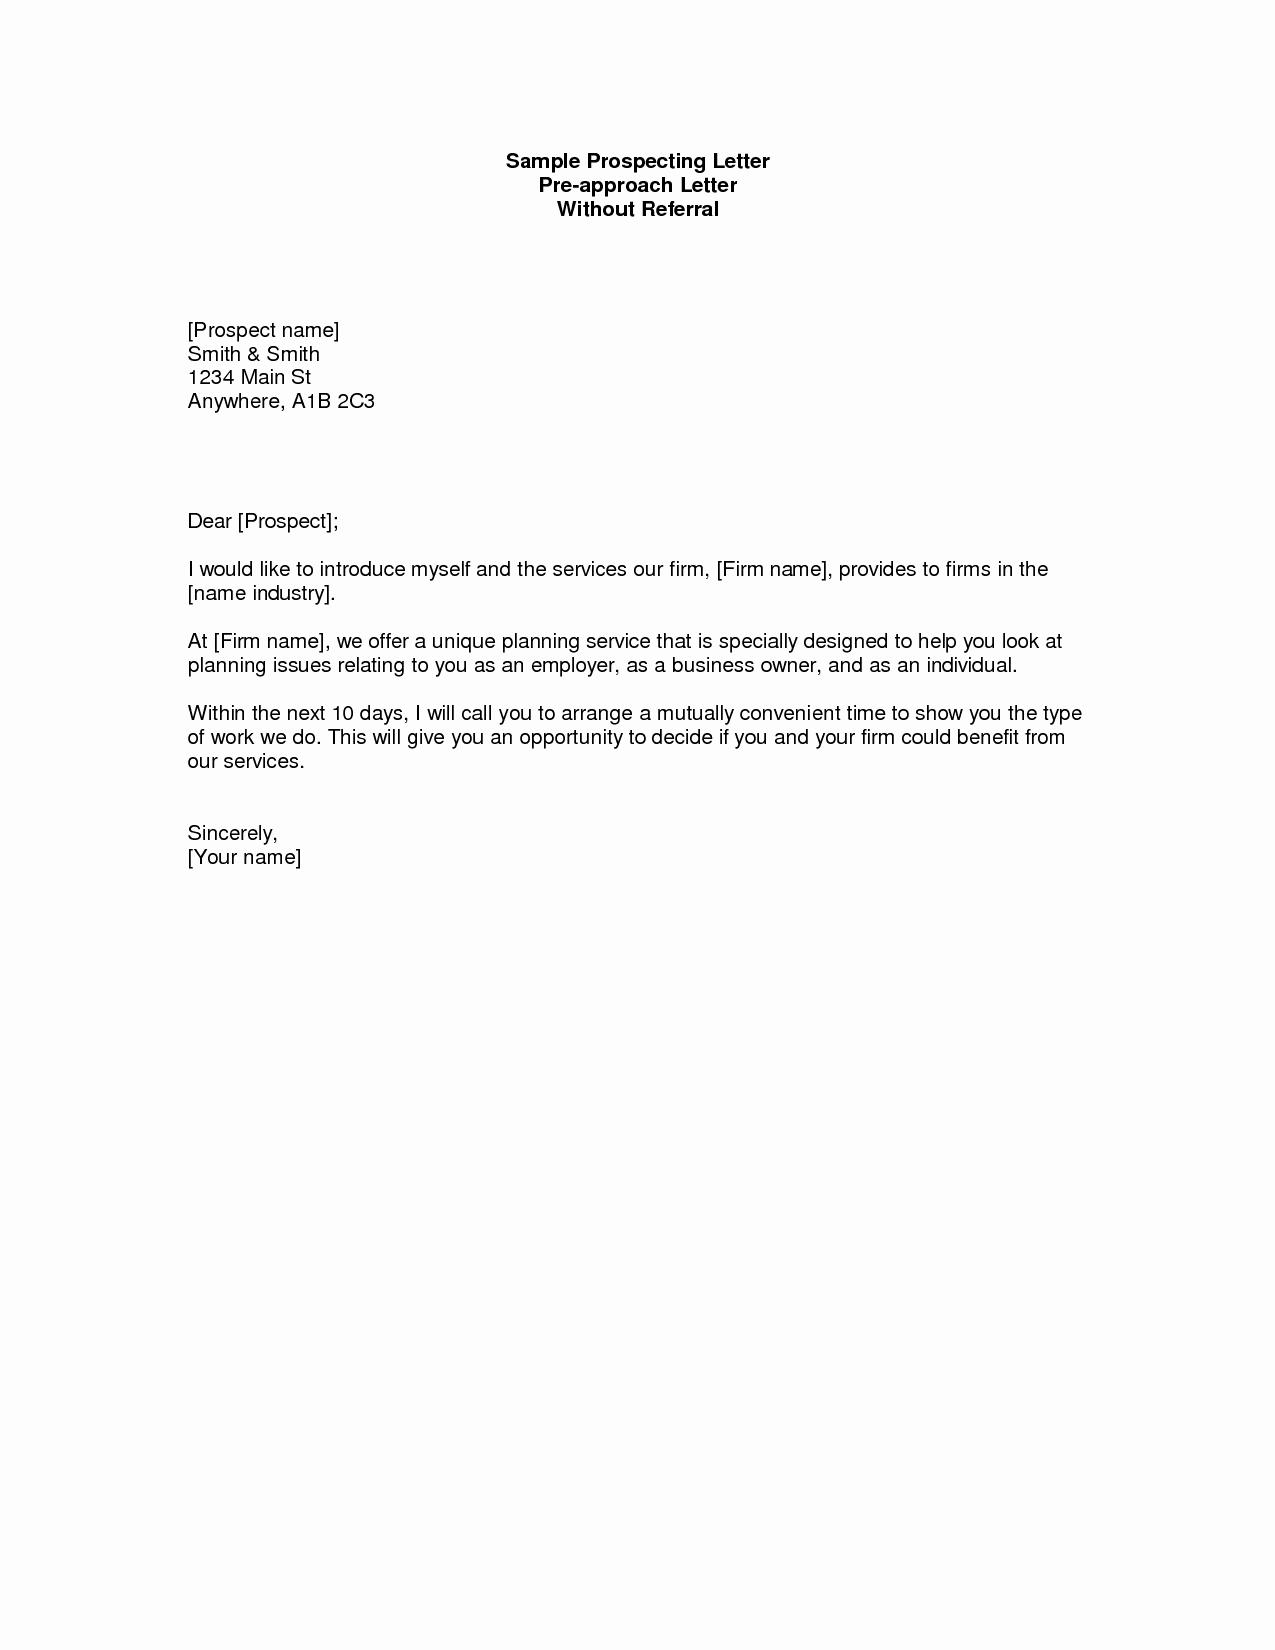 Real Estate Prospecting Letter Template - Real Estate Prospecting Letters Samples Beautiful Prospecting Letter